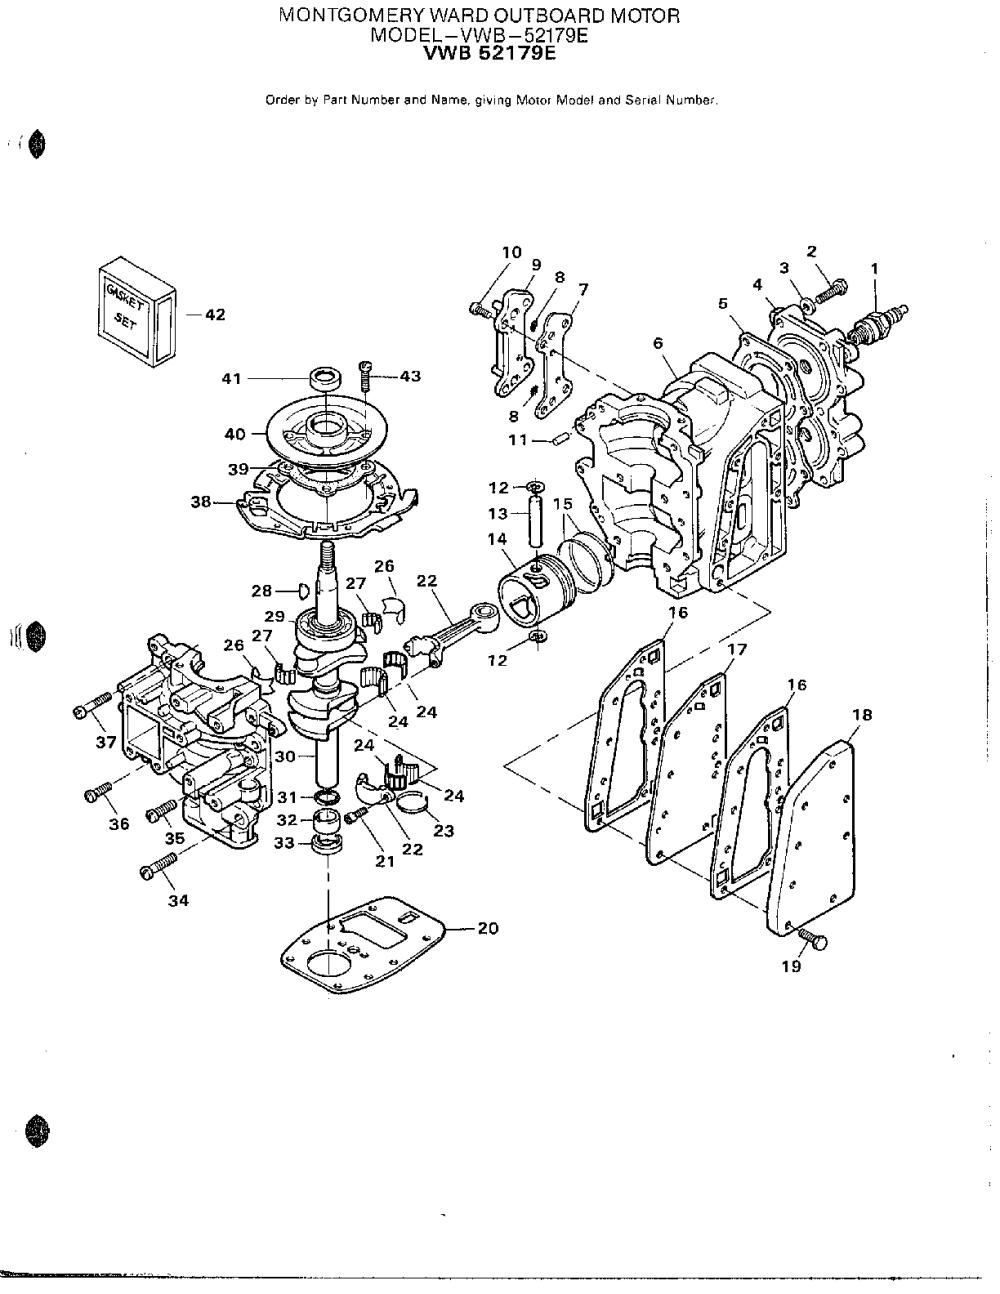 medium resolution of mercury 52179e outboard motor power head page 2 diagram